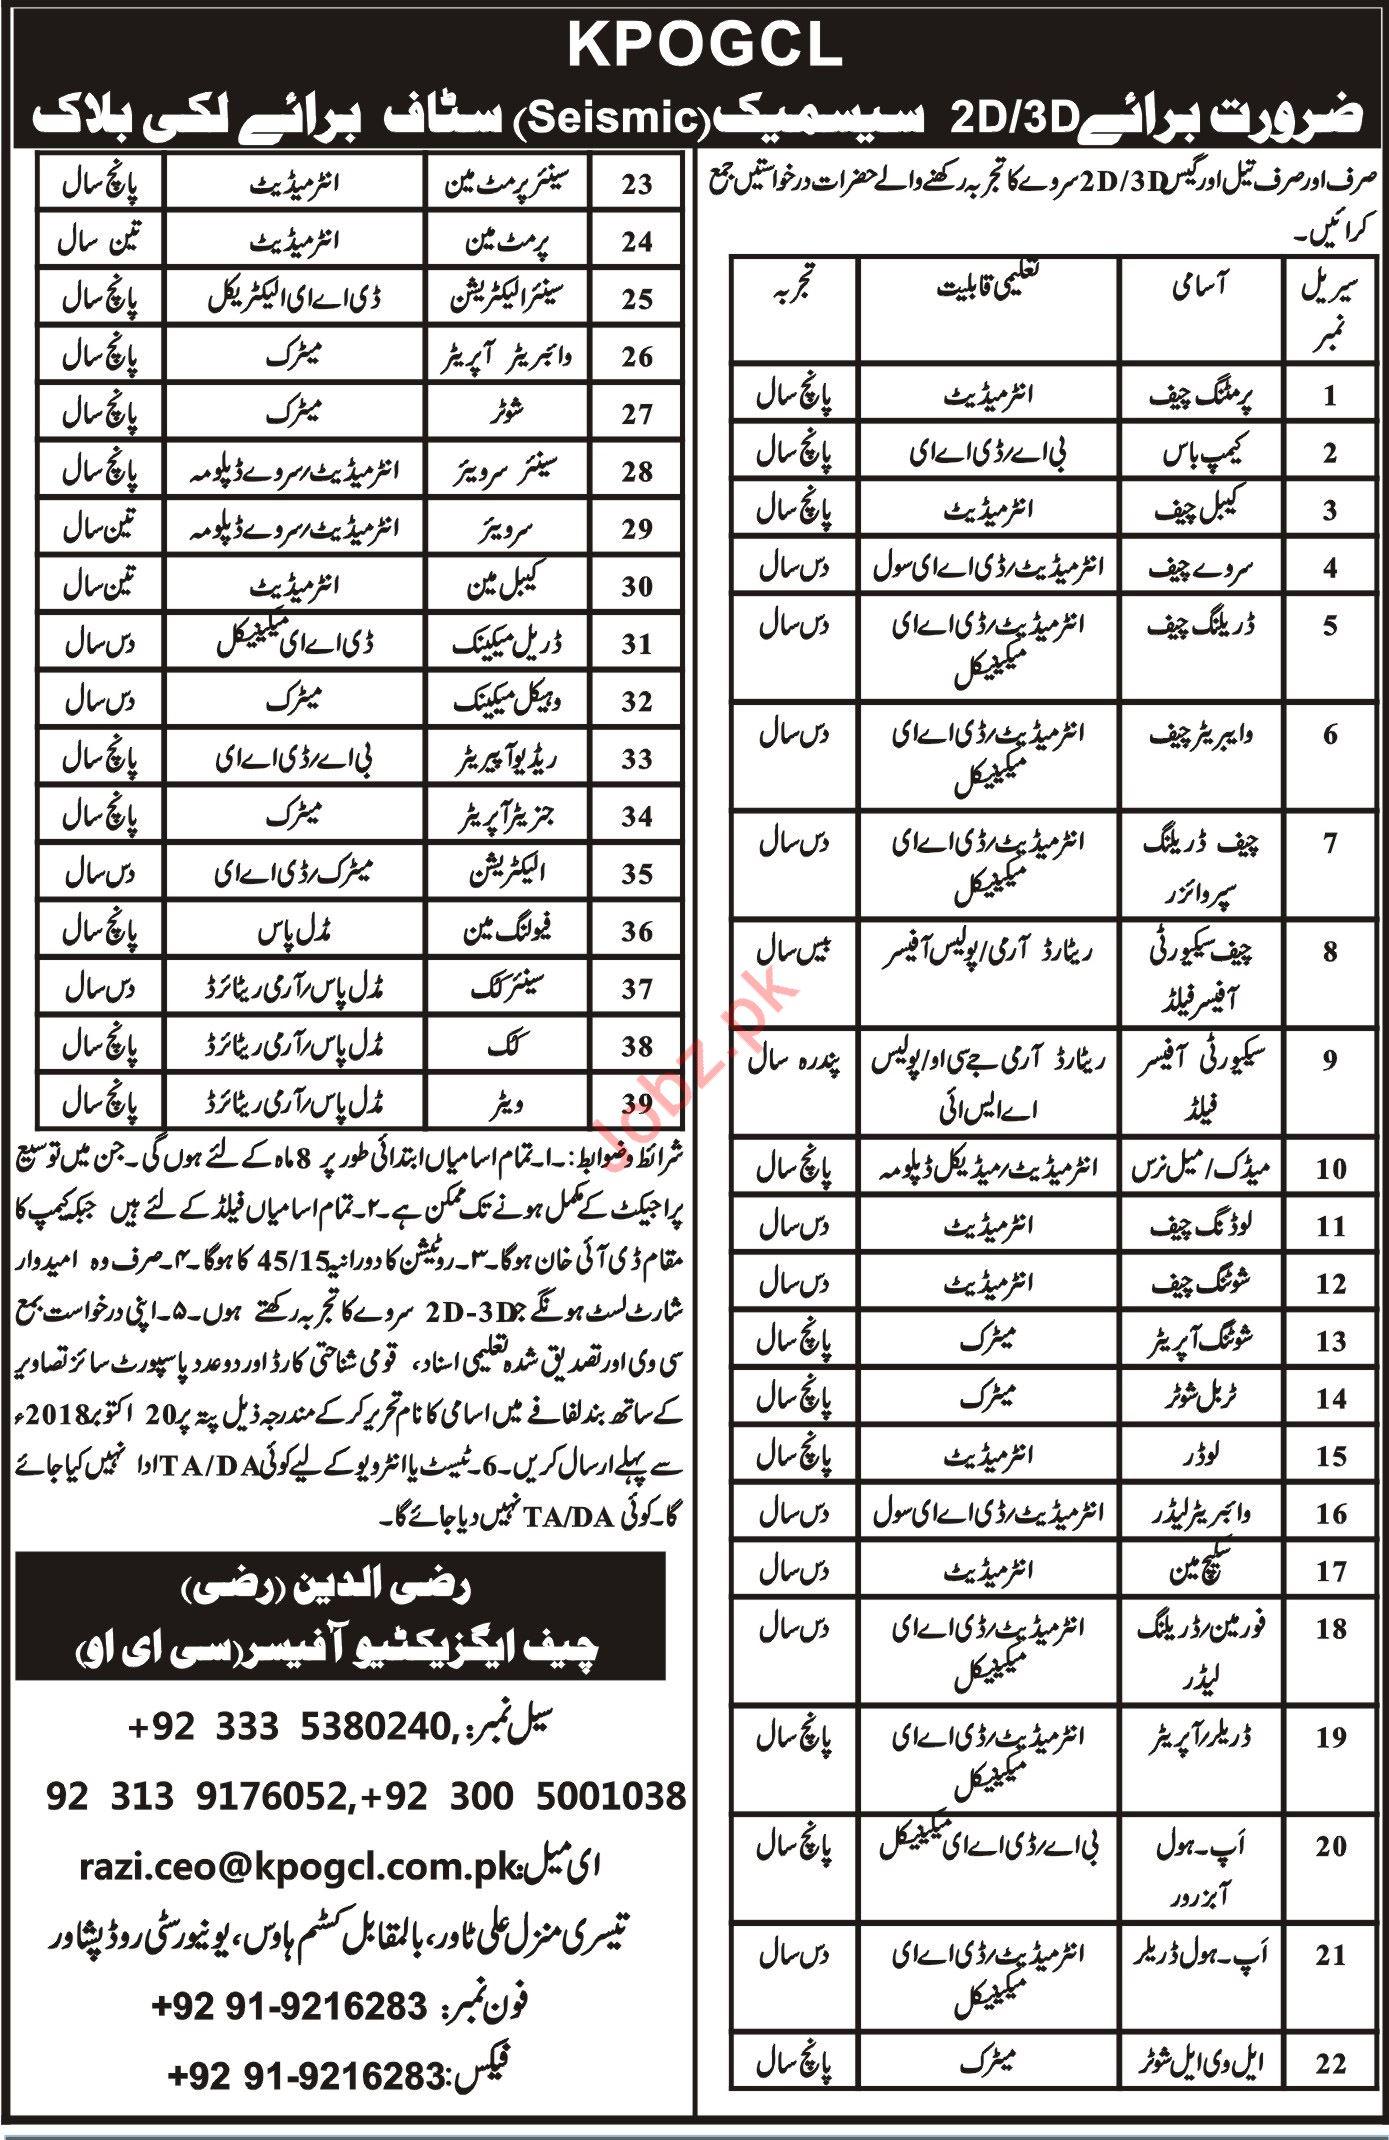 Khyber Pakhtunkhwa Oil & Gas Company KPOGCL Jobs 2018